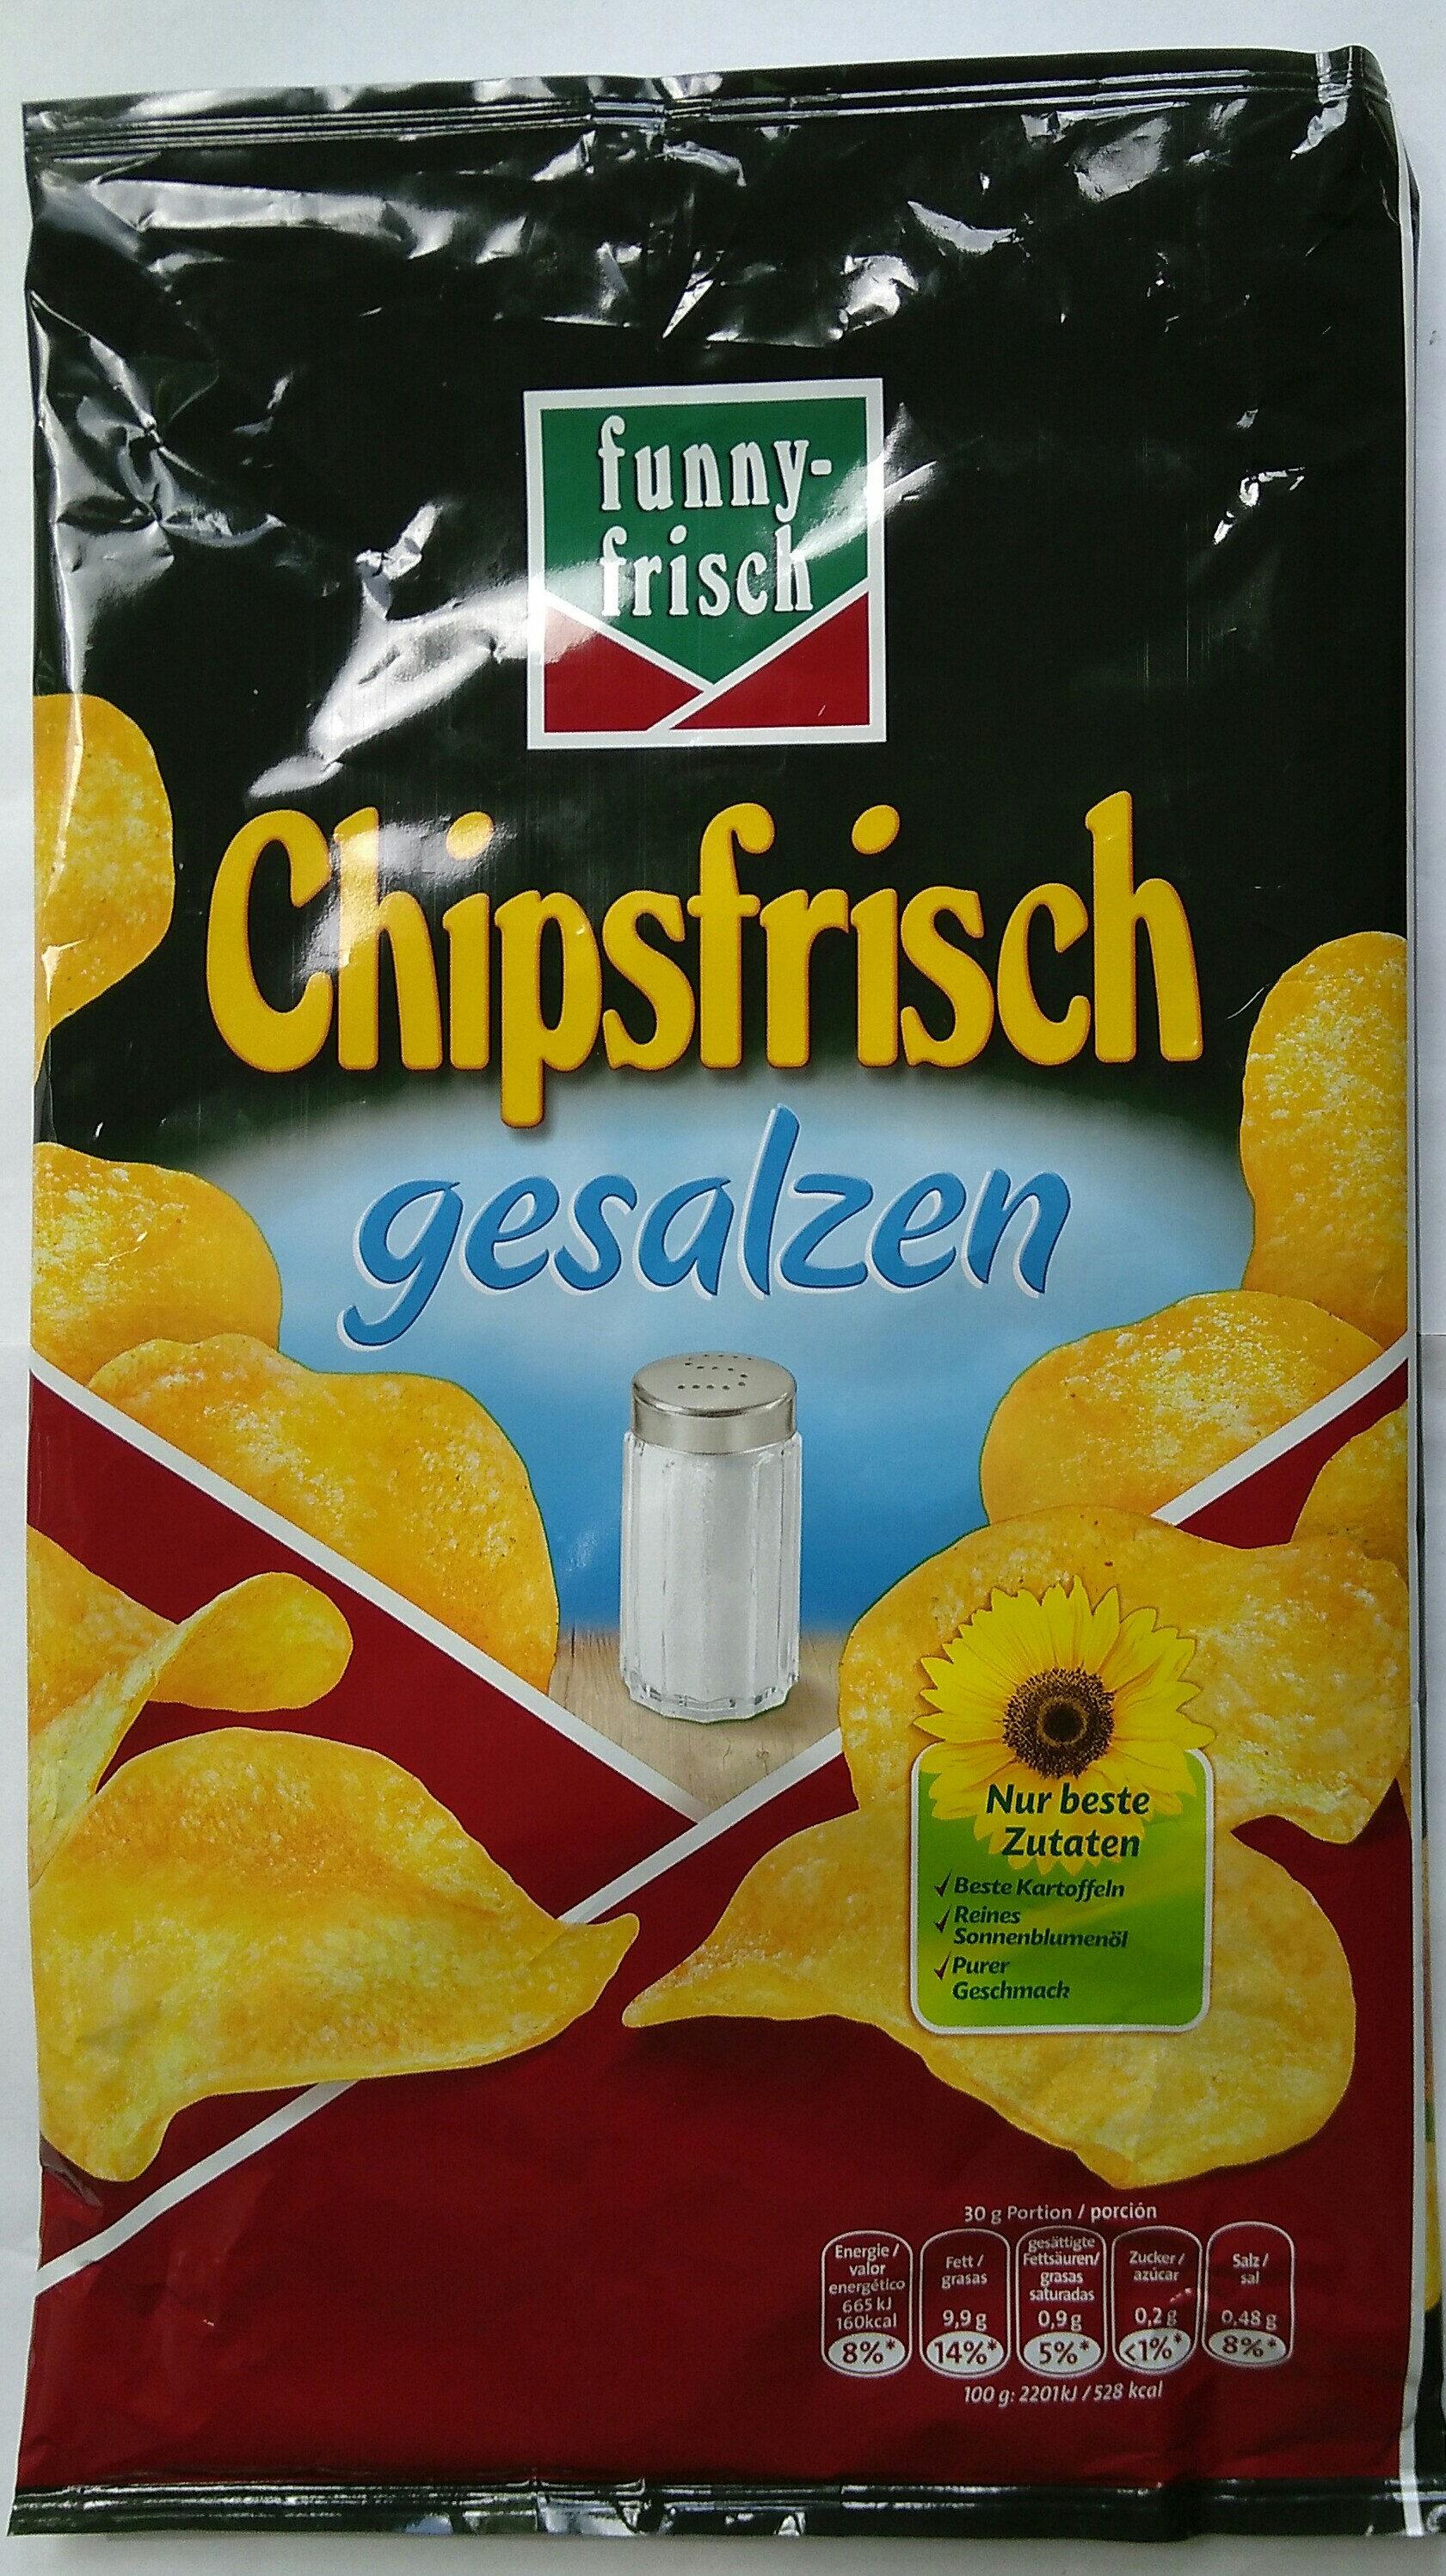 Chipsfrisch gesalzen - Produit - de